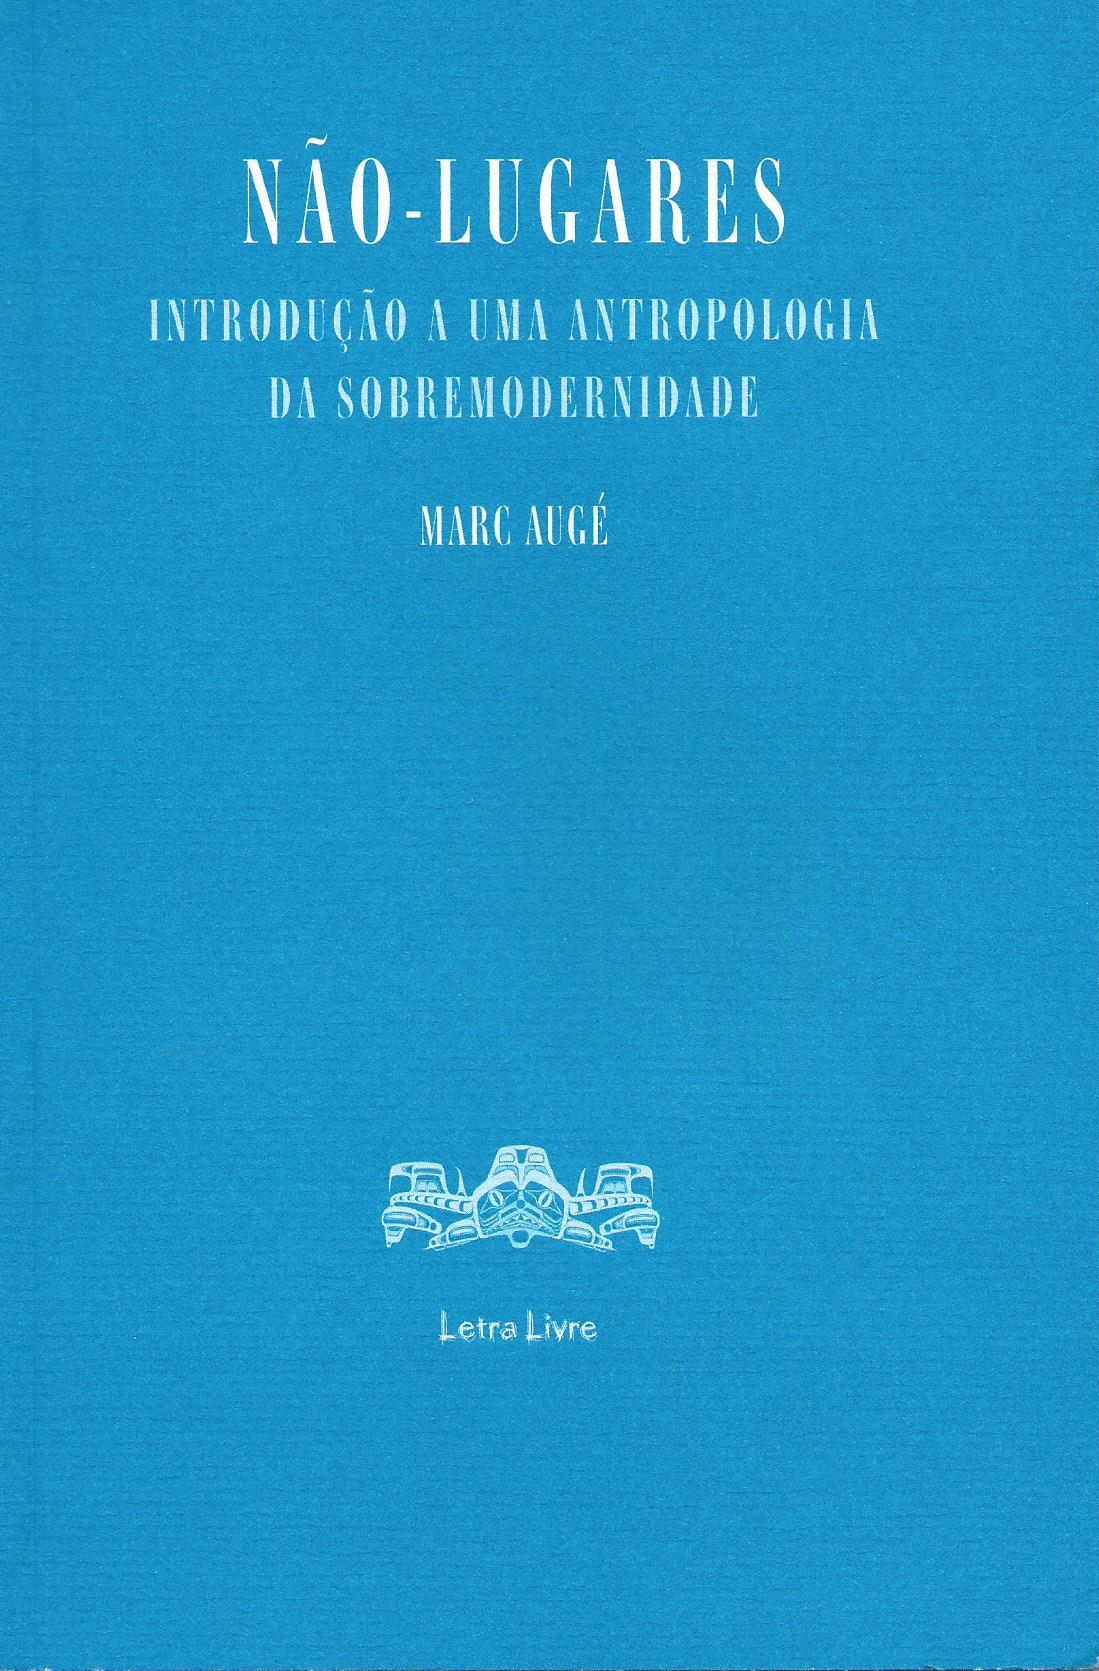 marcaugenaolugares